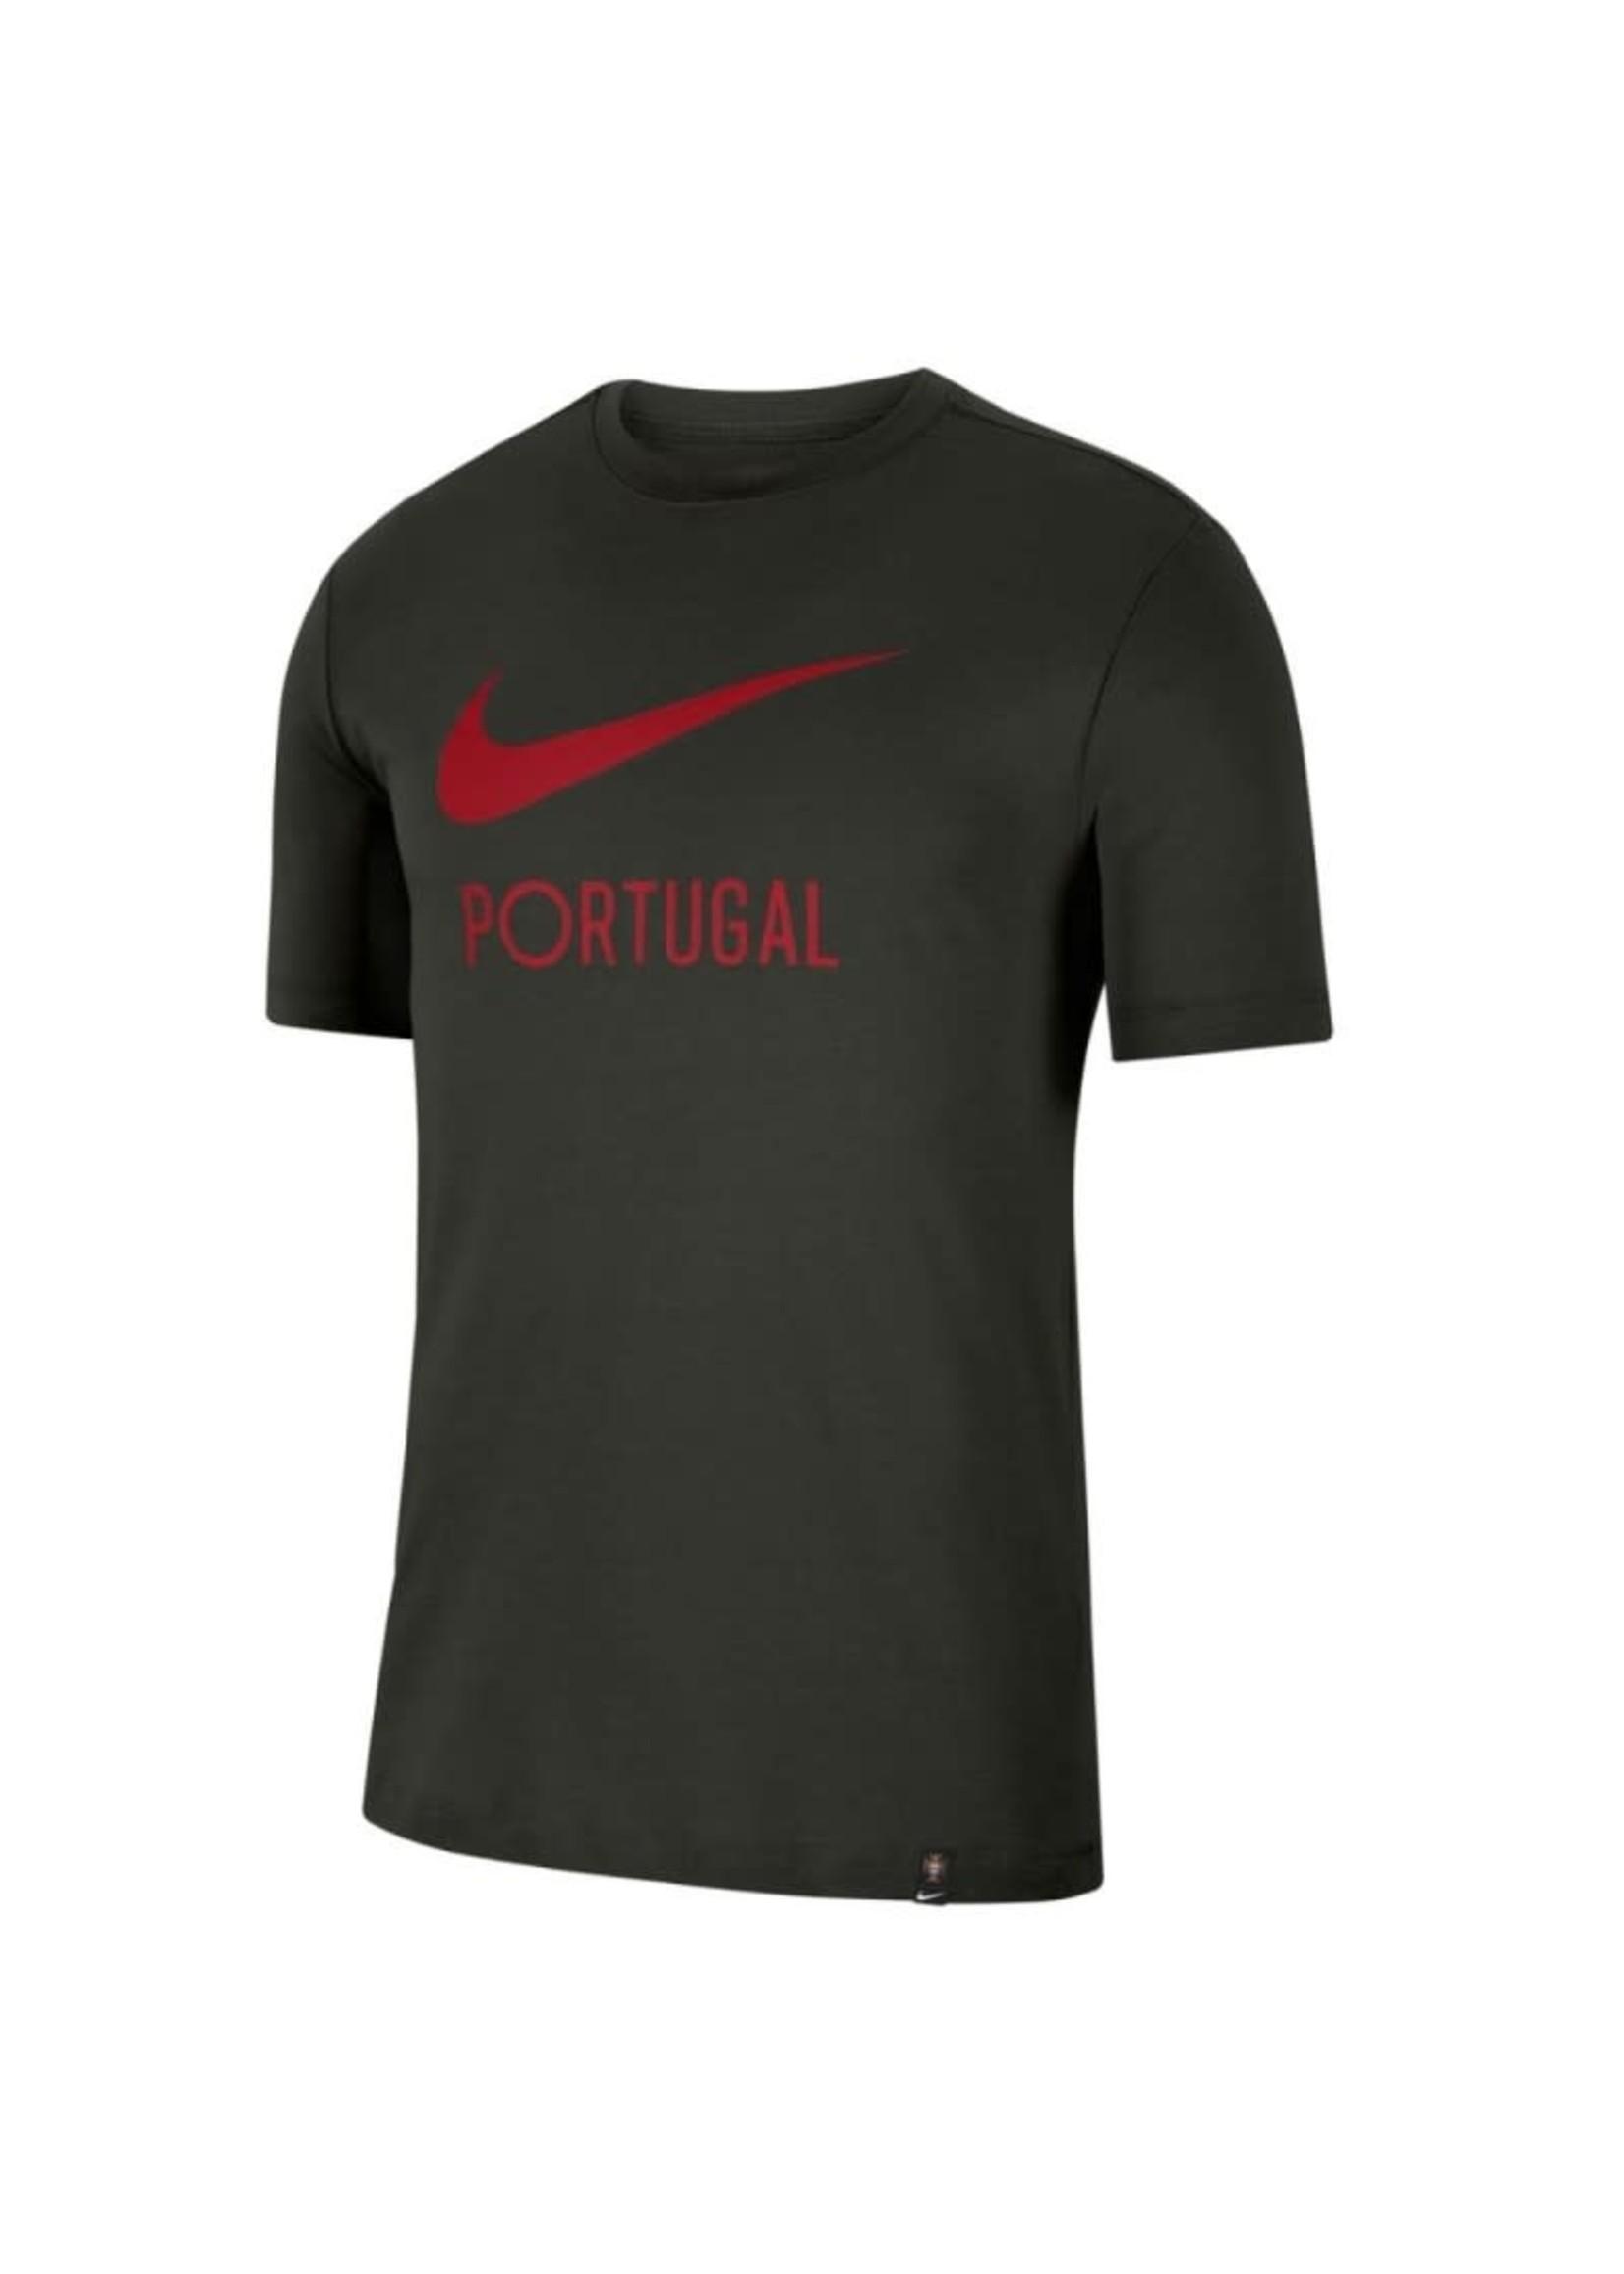 Nike Portugal T-Shirt - Home